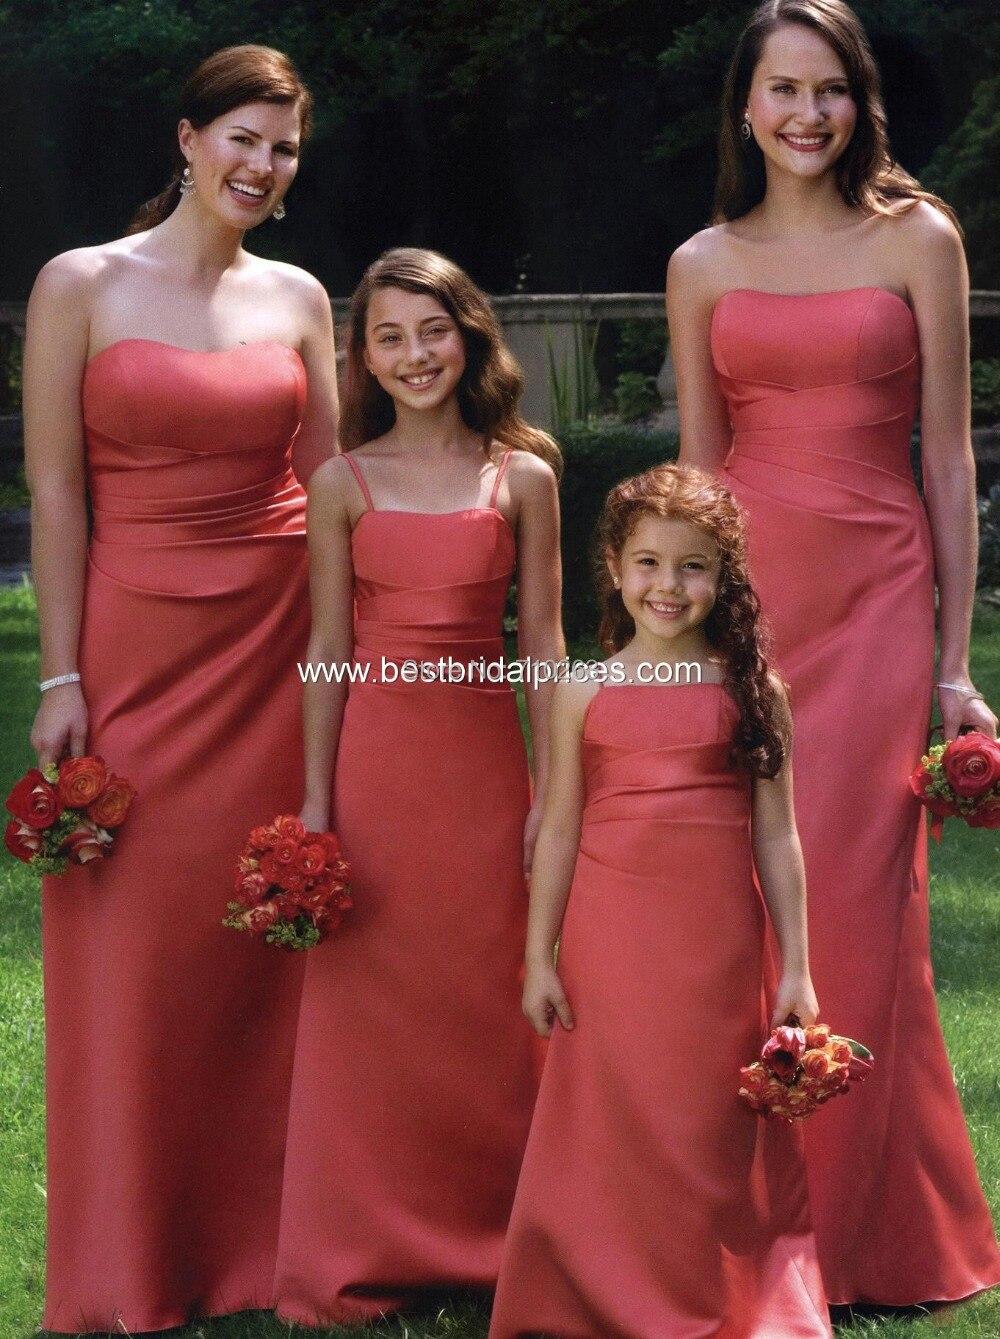 2014 New Sheath Strapless Sleeveless Floor Length Satin Bridesmaid Dresses with Ruffles KM-286 Custom Size 2 4 6 8 10 12 14 16